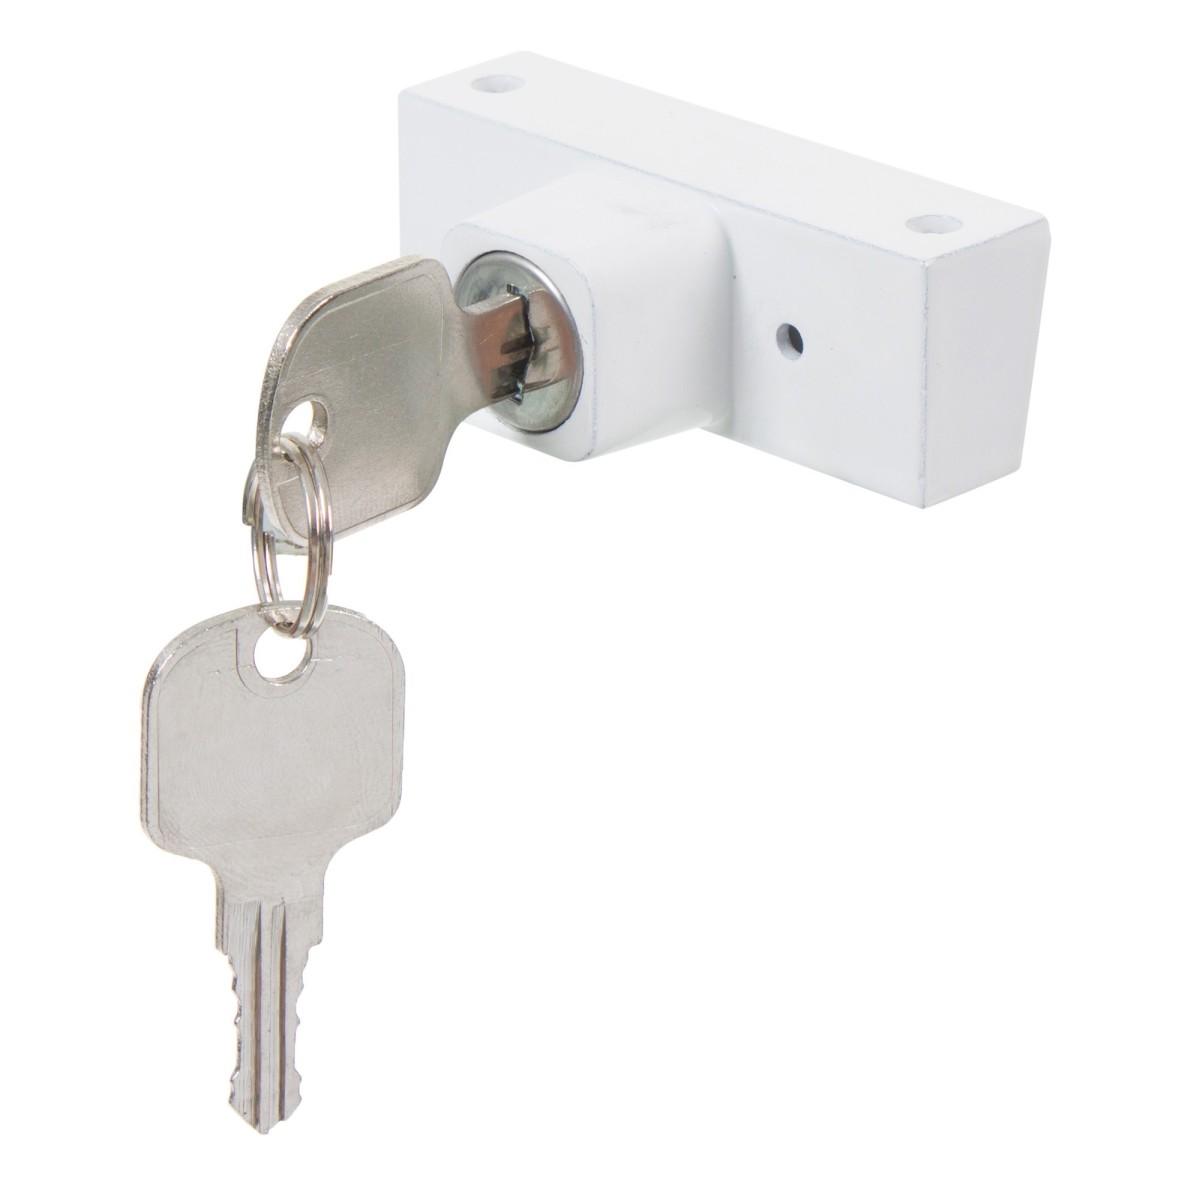 Замок-блокиратор для окна с цилиндром 2 ключа